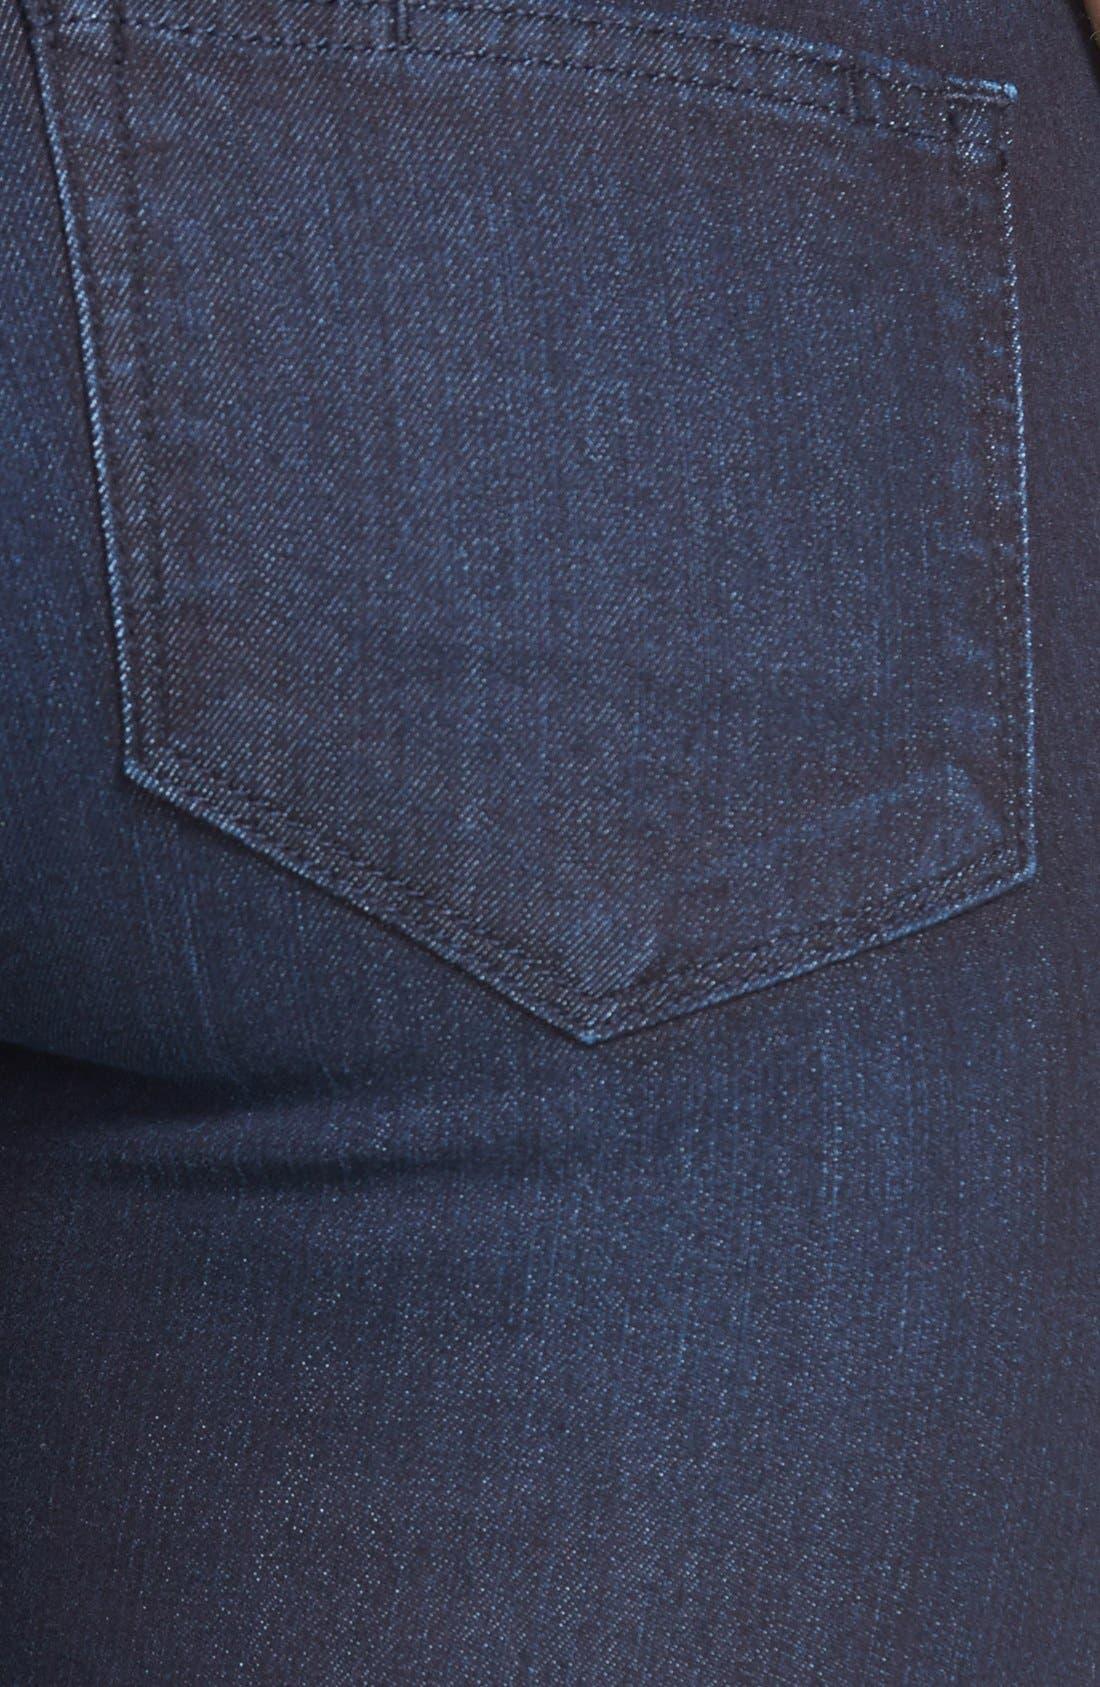 Alternate Image 3  - Paige Denim 'Skyline' Straight Leg Jeans (Palmer) (Nordstrom Exclusive)